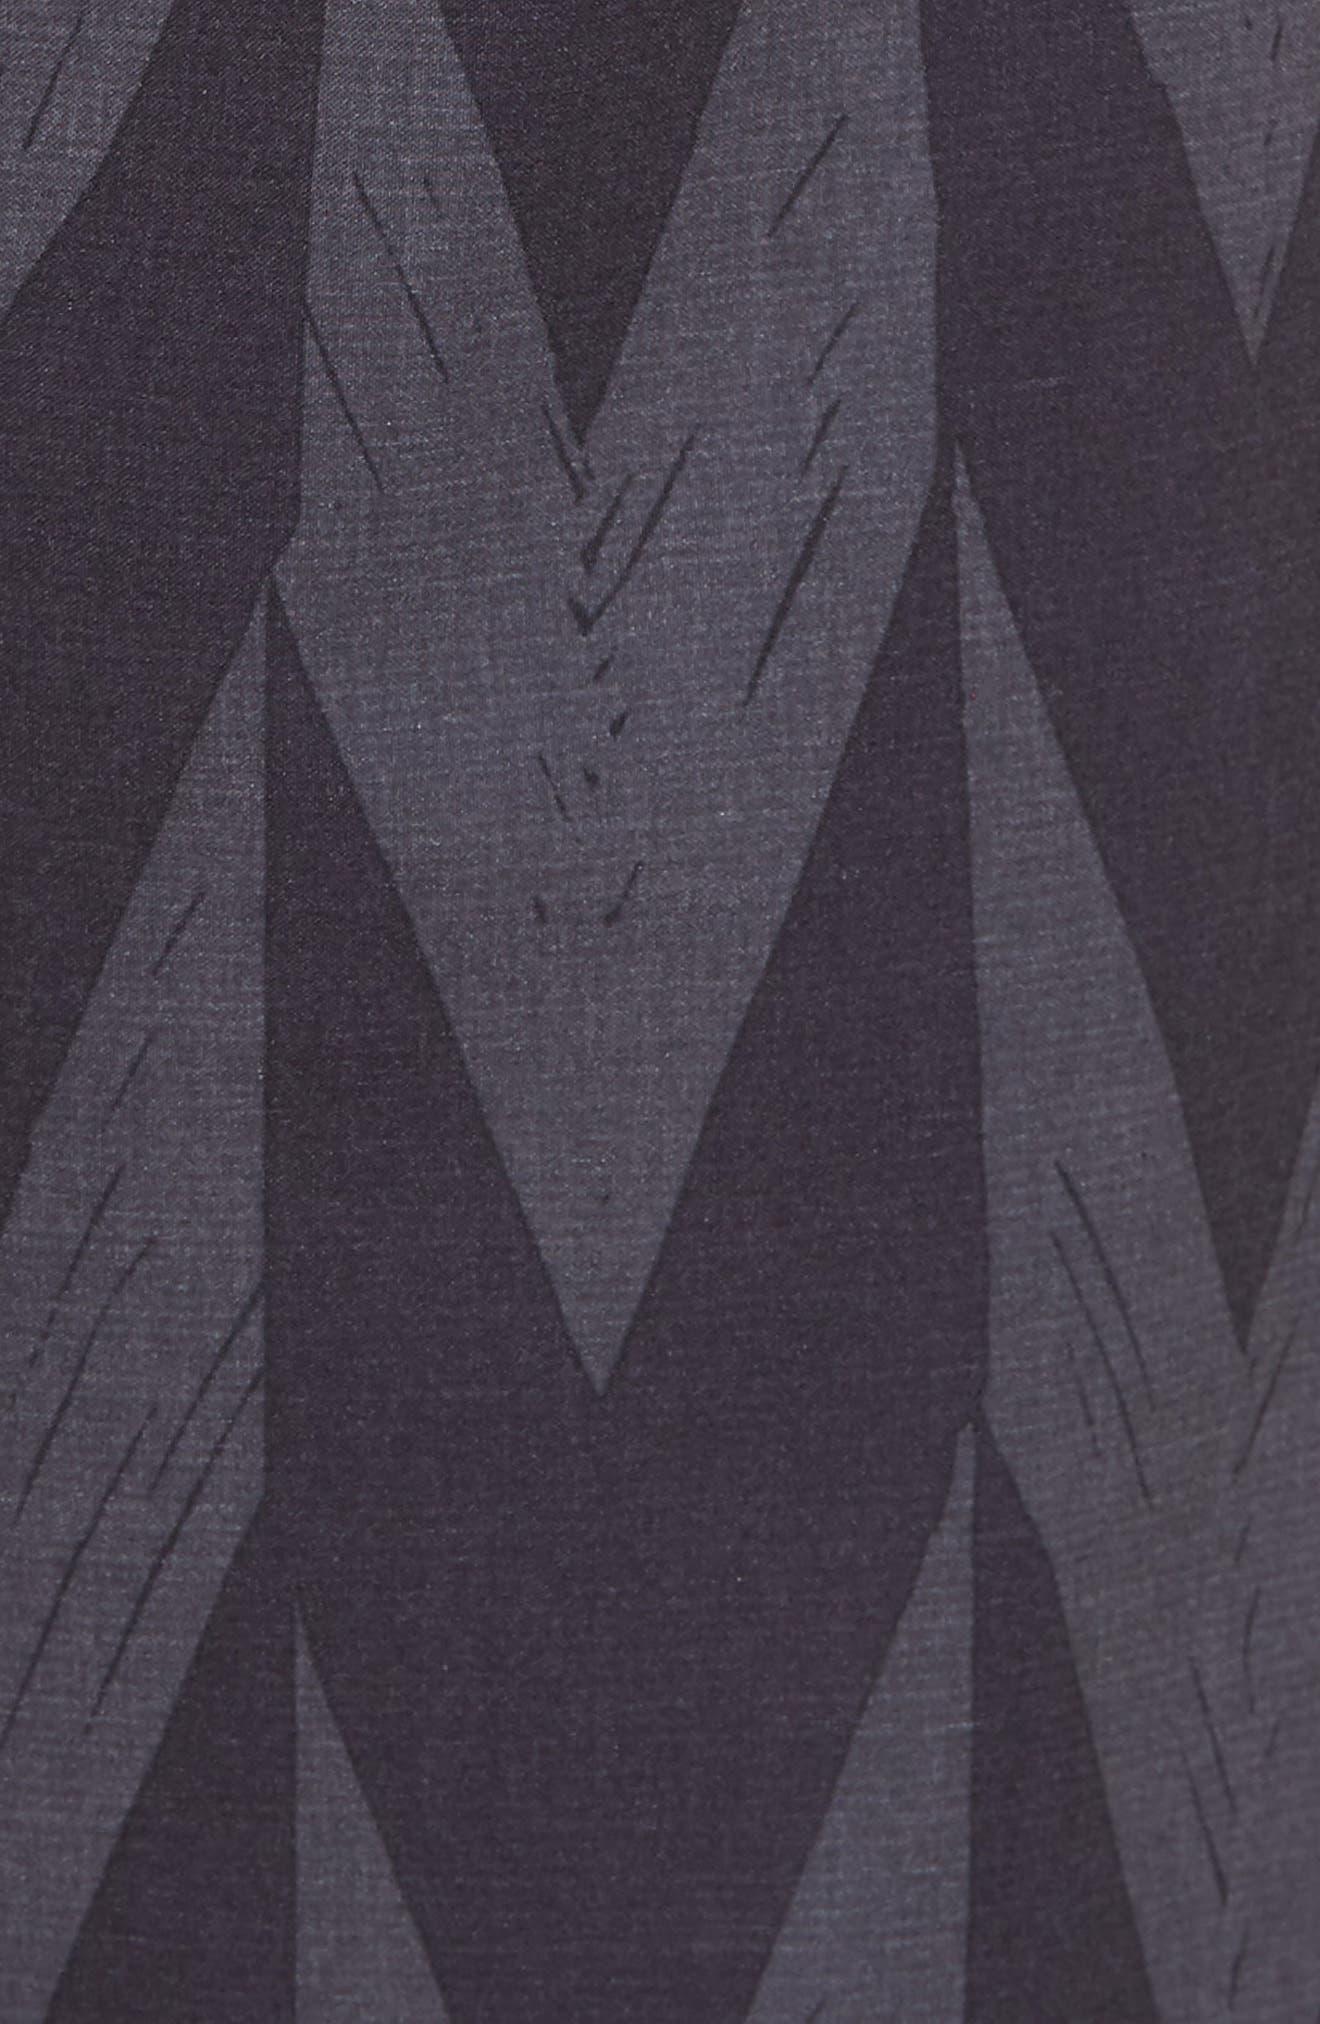 Phantom Bula Board Shorts,                             Alternate thumbnail 5, color,                             010